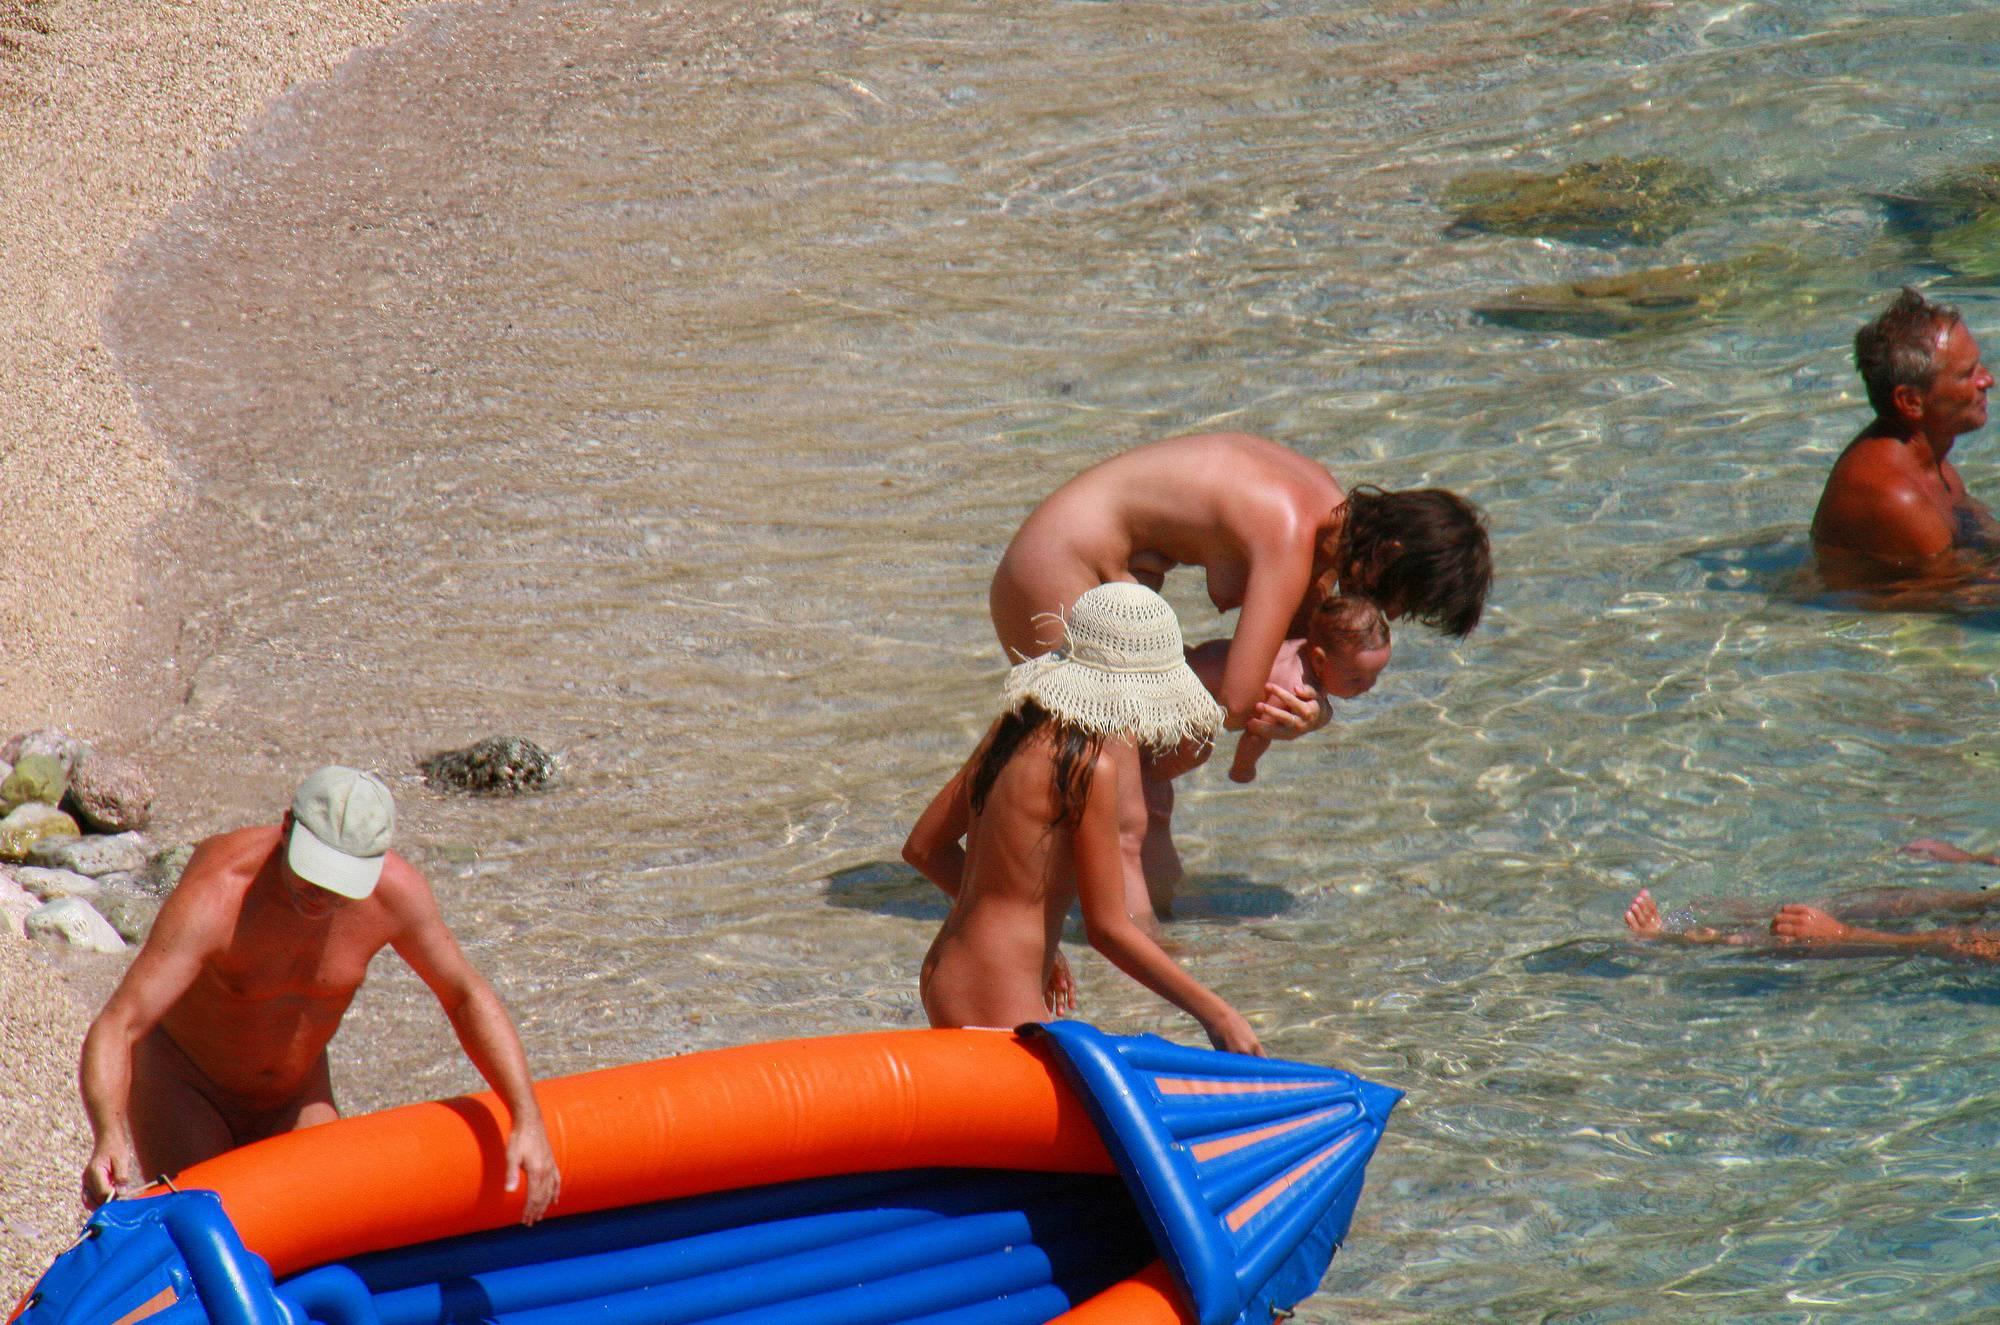 Ula FKK Family's Water Raft - 1